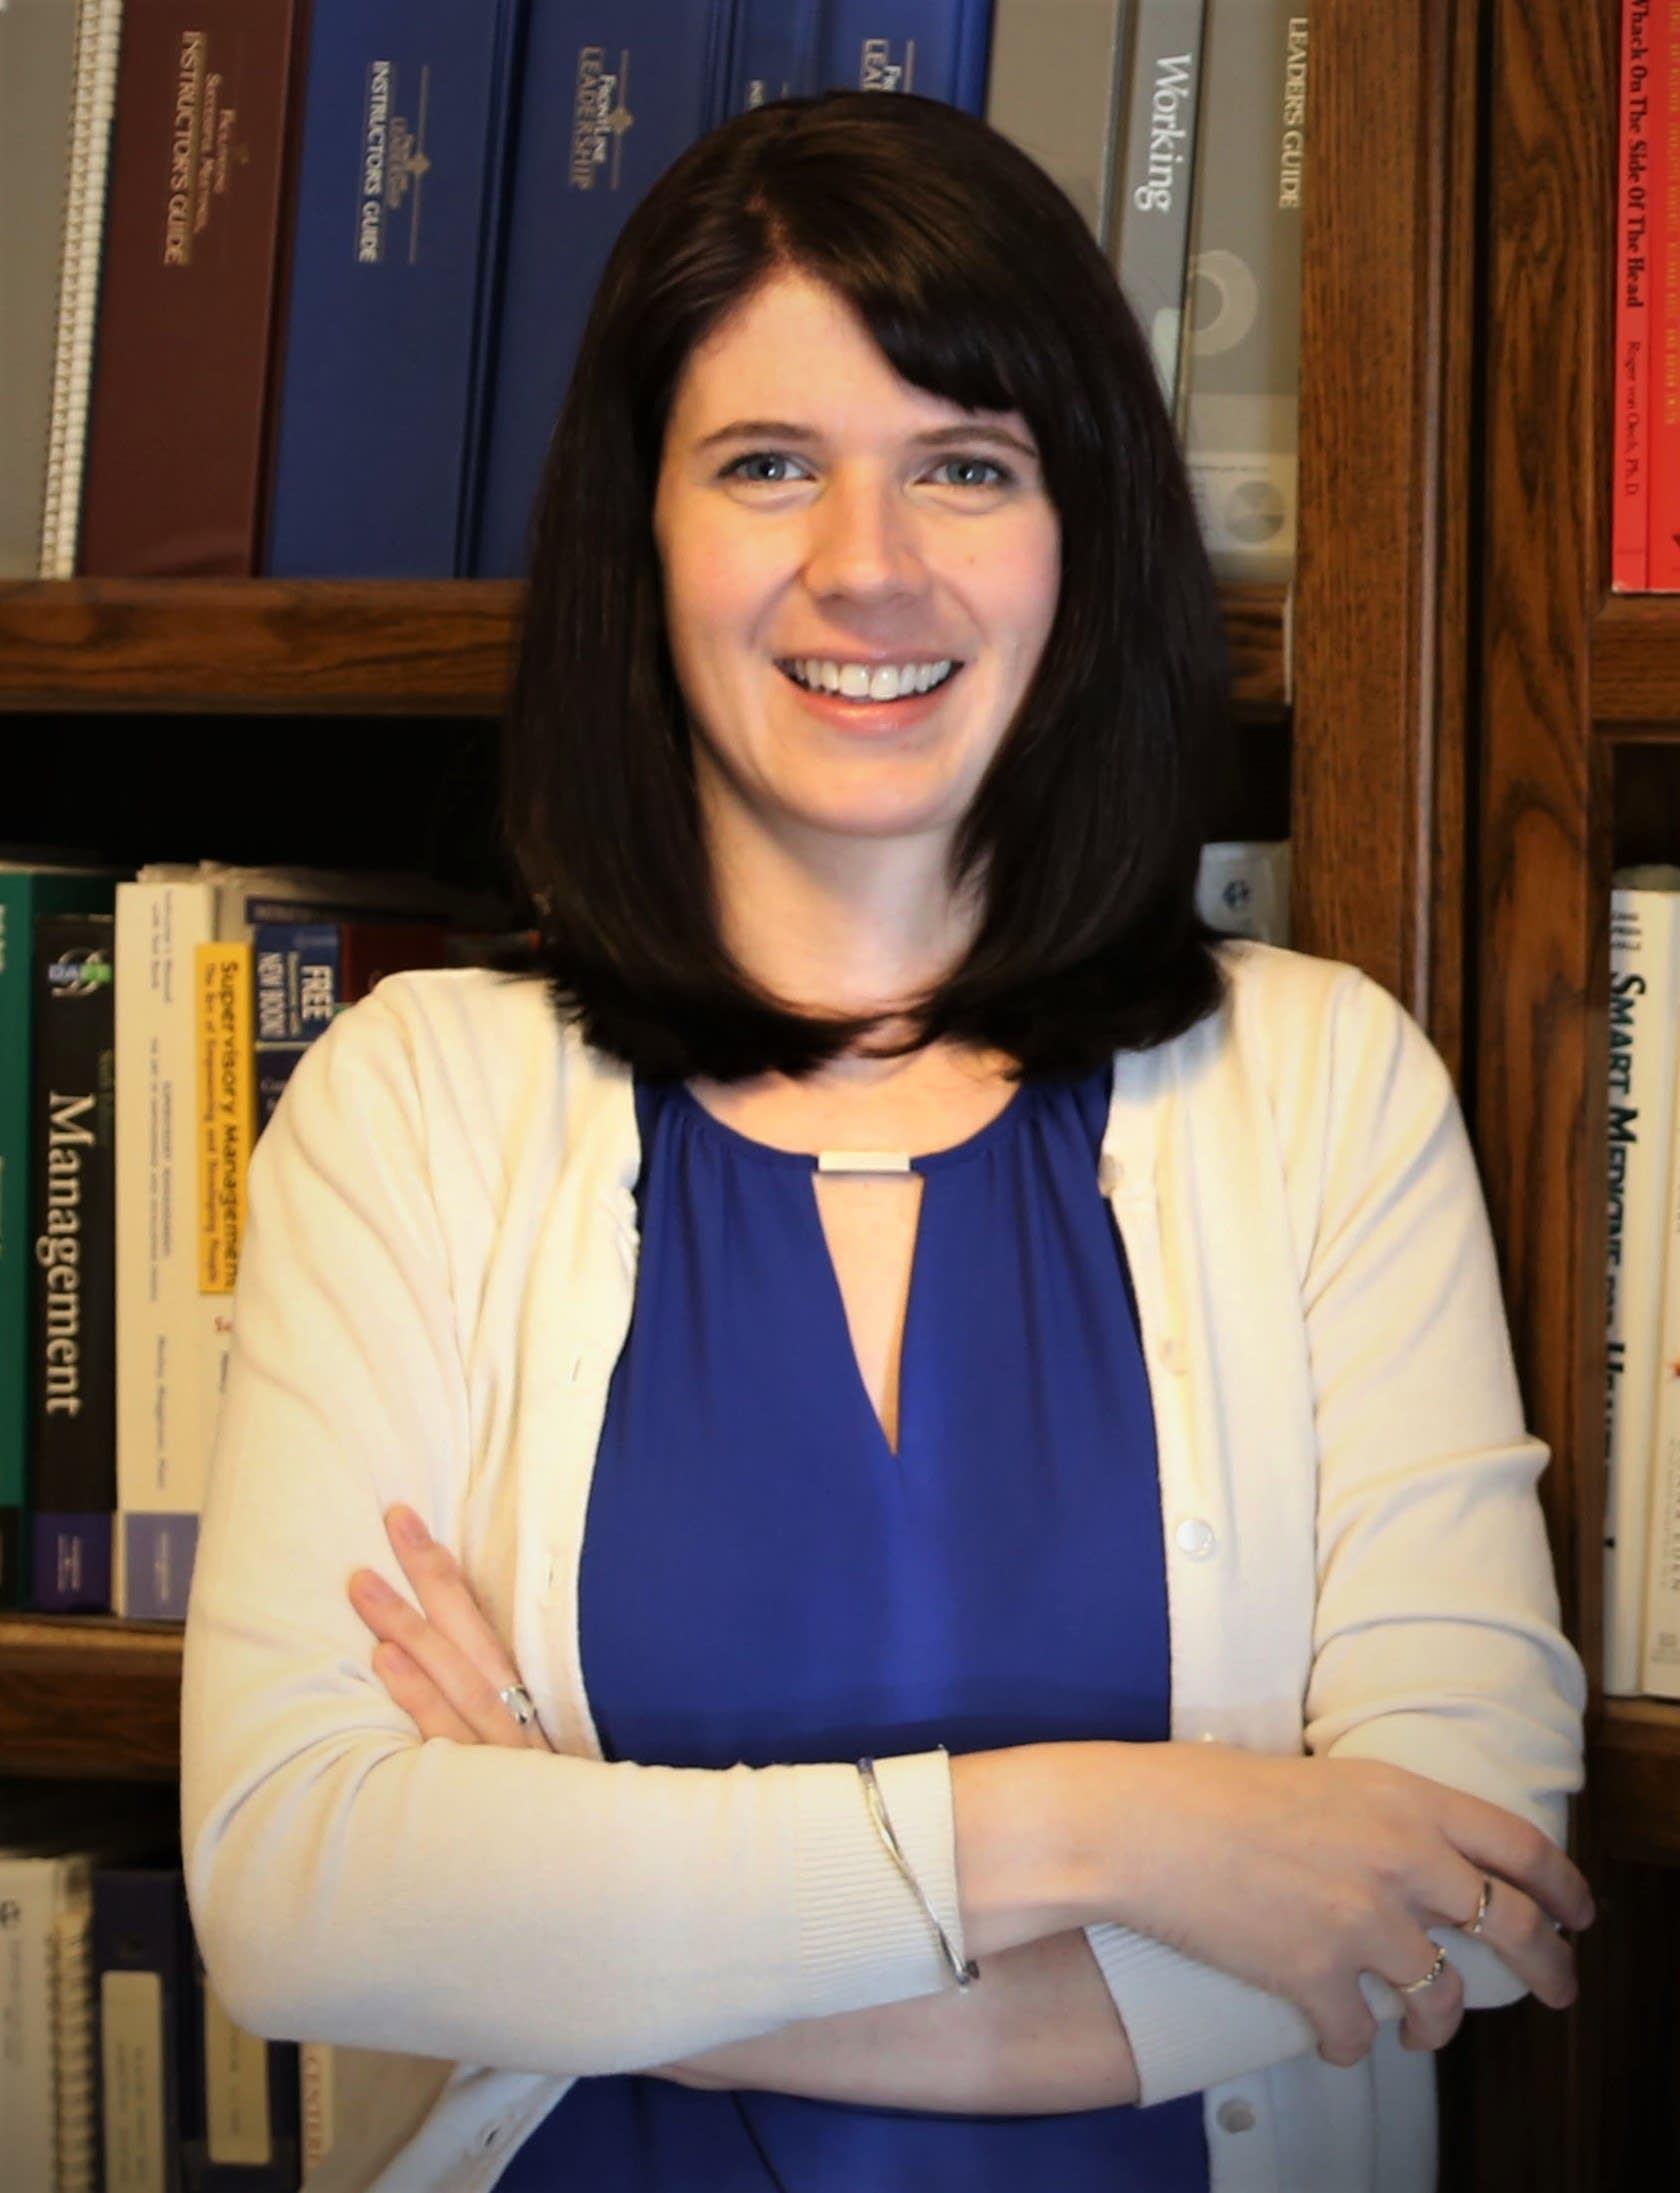 Leah Phifer will challenge incumbent Congressman Rick Nolan.